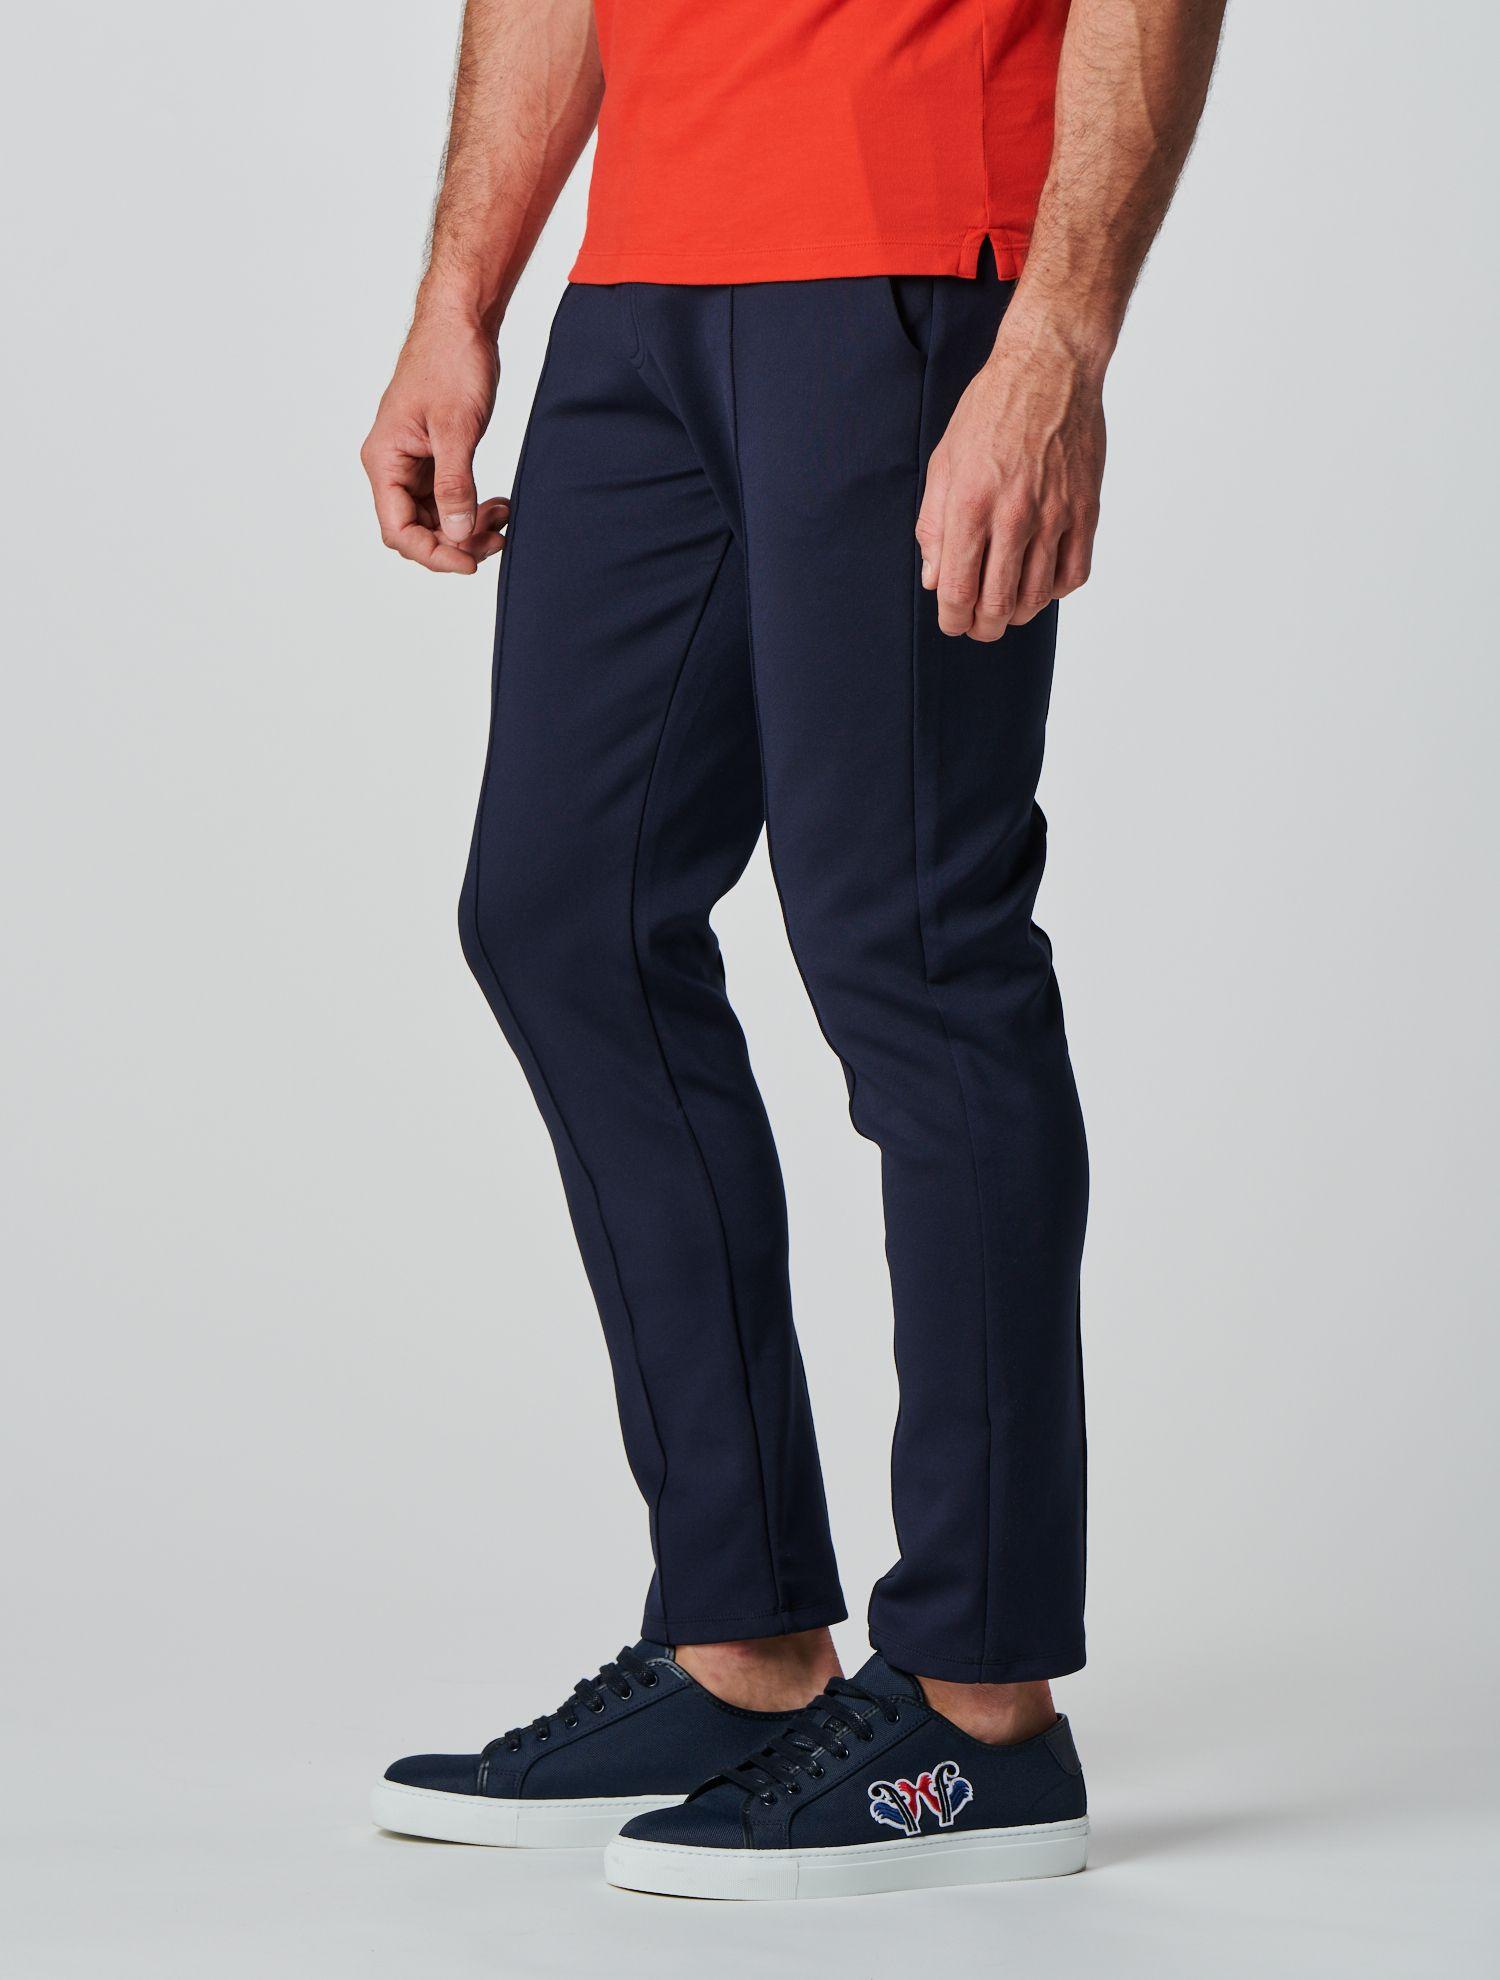 MALAGA II PANTS